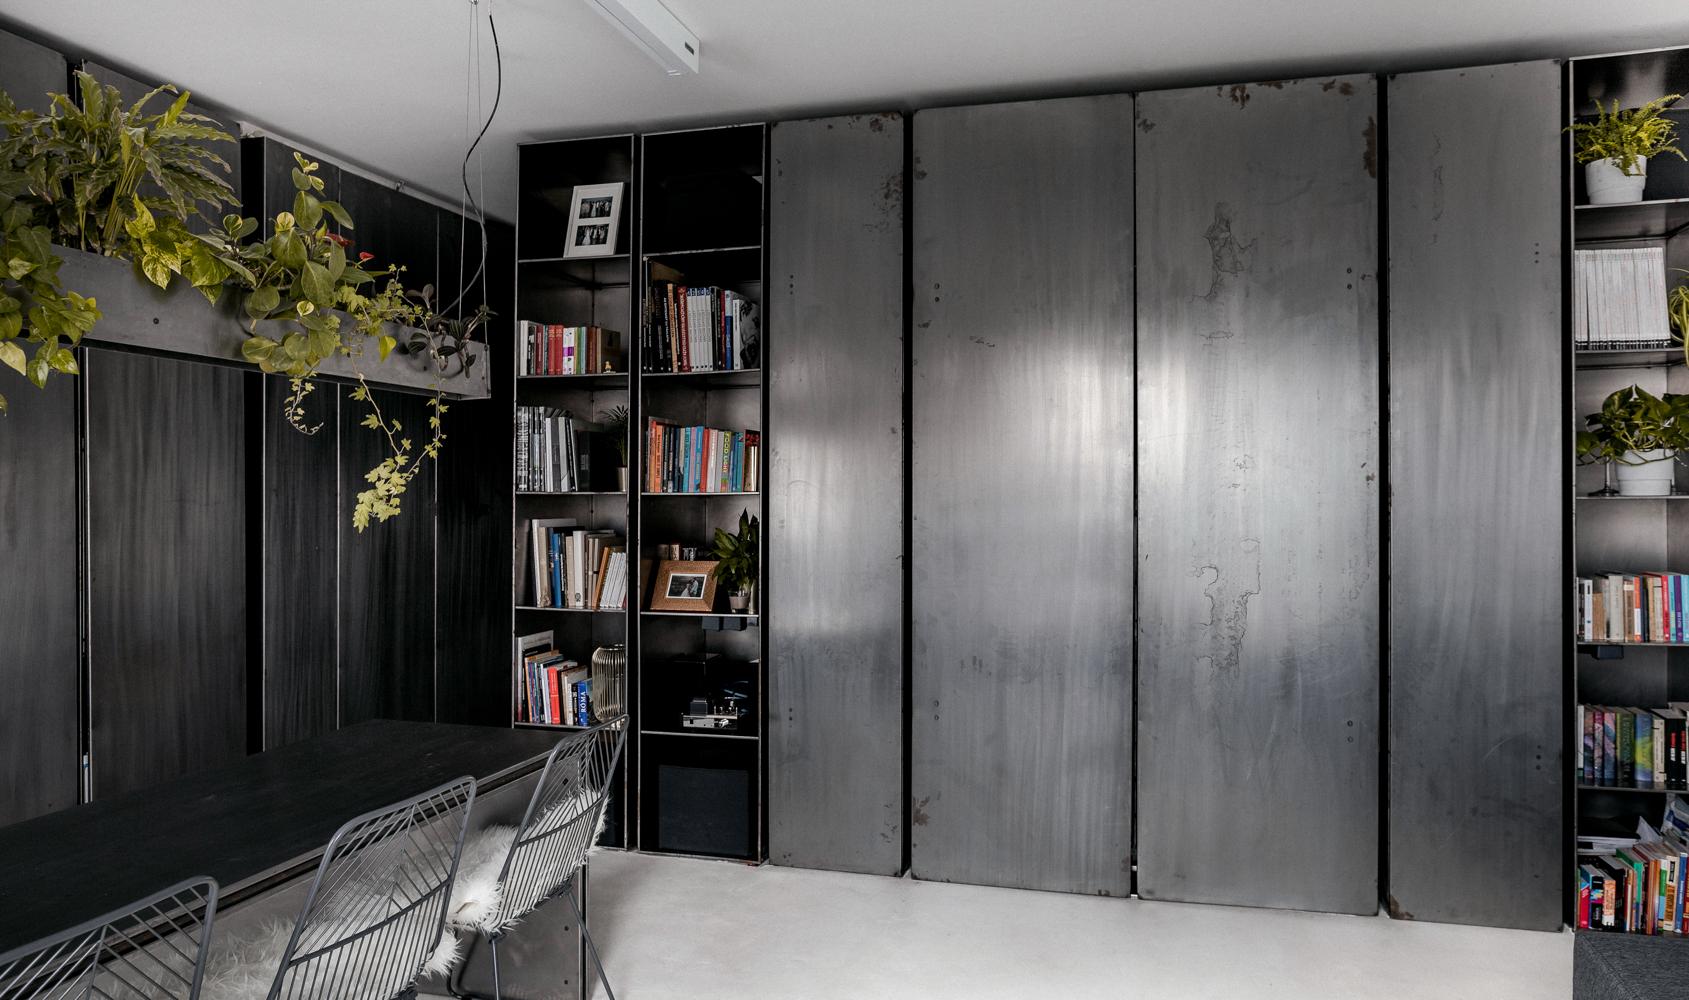 zero-room-apartment-mas-the-design-emotive-09.jpg